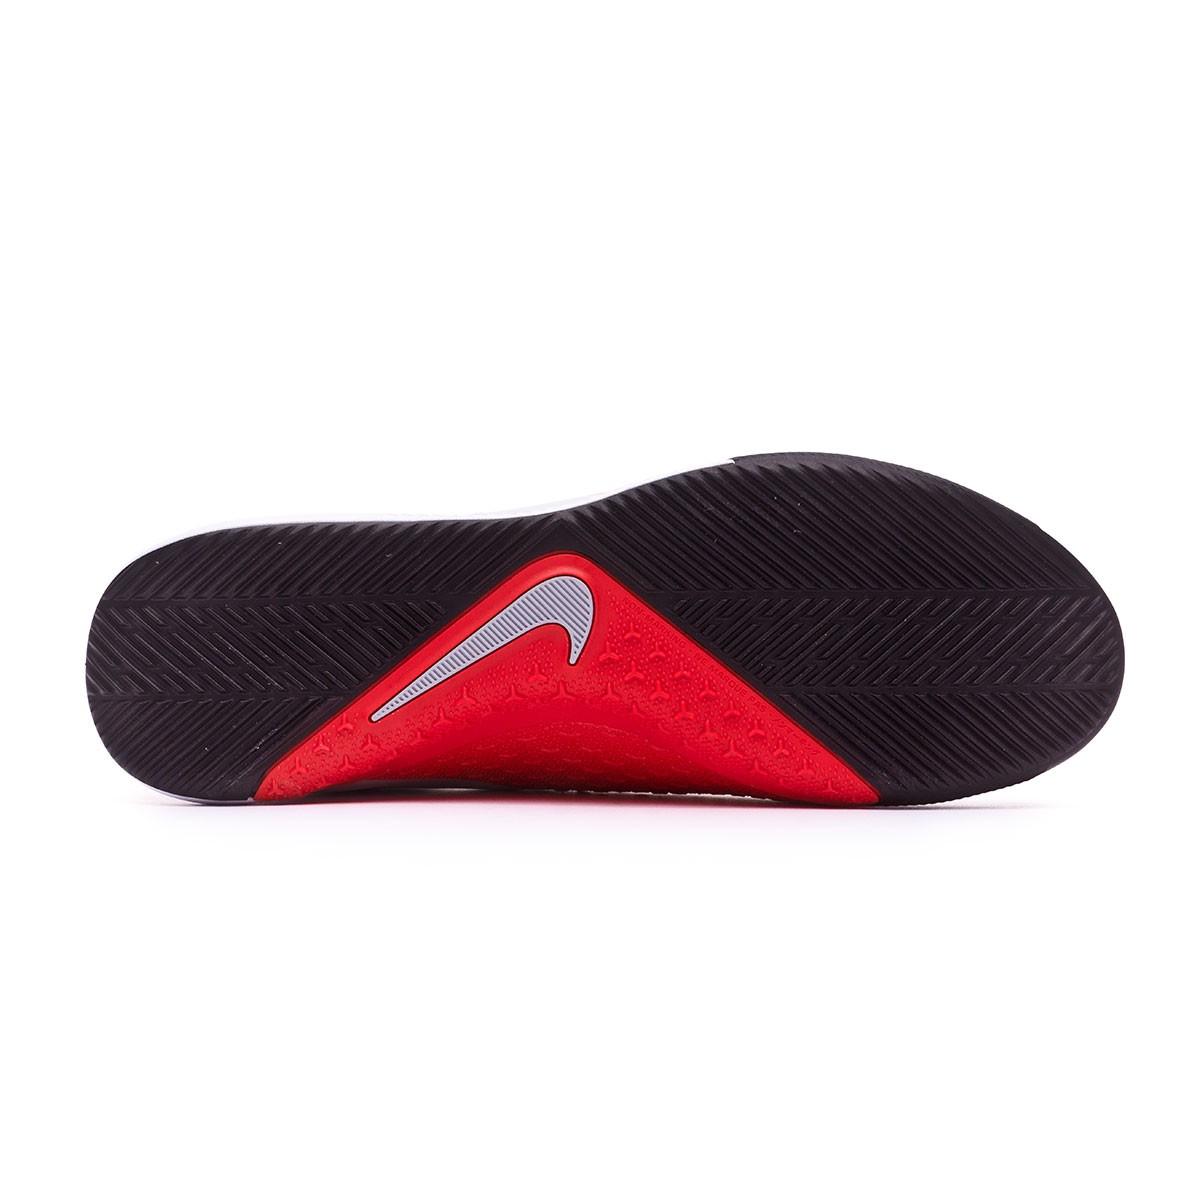 fadc3f98f6 Futsal Boot Nike Phantom Vision Academy DF IC Pure platinum-Black-Light  crimson-Dark grey - Football store Fútbol Emotion